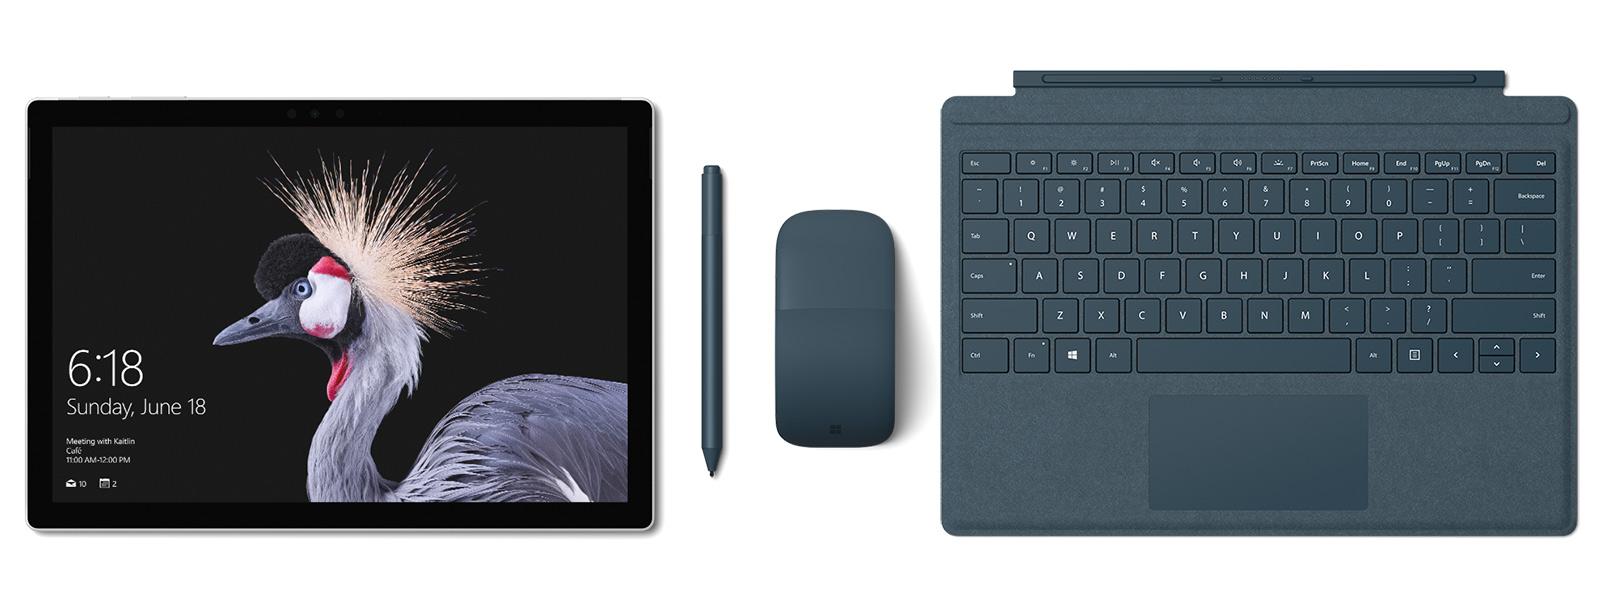 带灰钴蓝 Surface Pro 特制版专业键盘盖、Surface 触控笔和 Surface Arc Mouse 的 Surface Pro 的图像。Surface 触控笔陪伴左右。